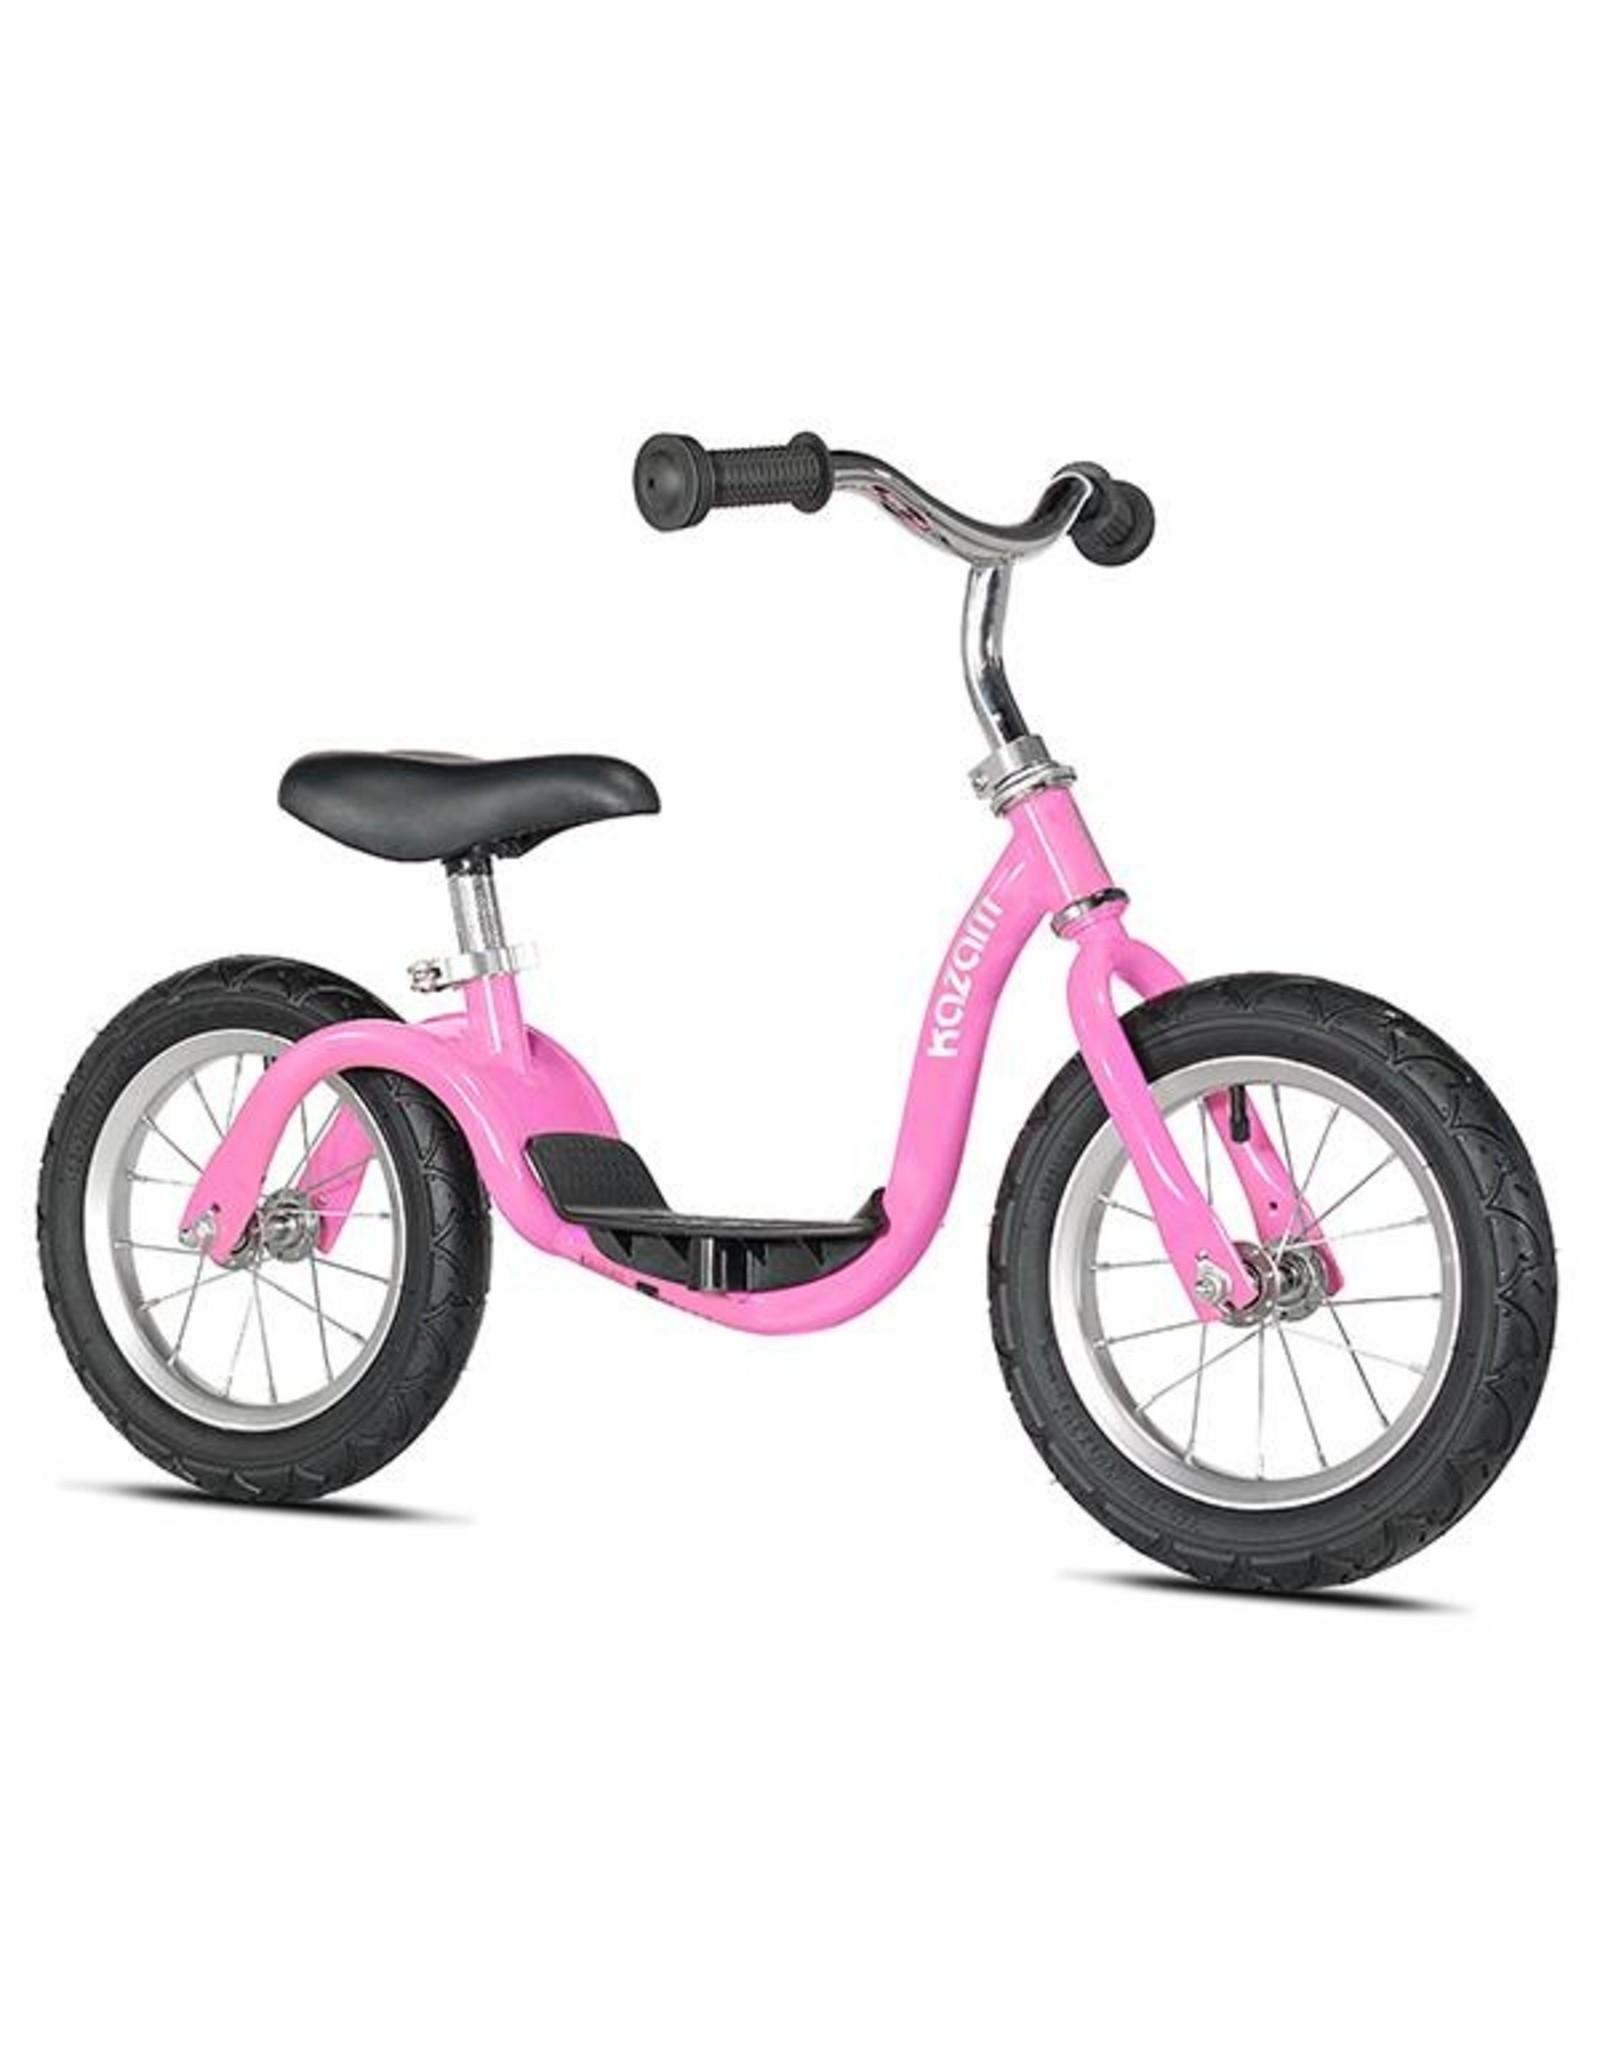 Kazam KaZAM v2s Balance Bike: Metallic Pink